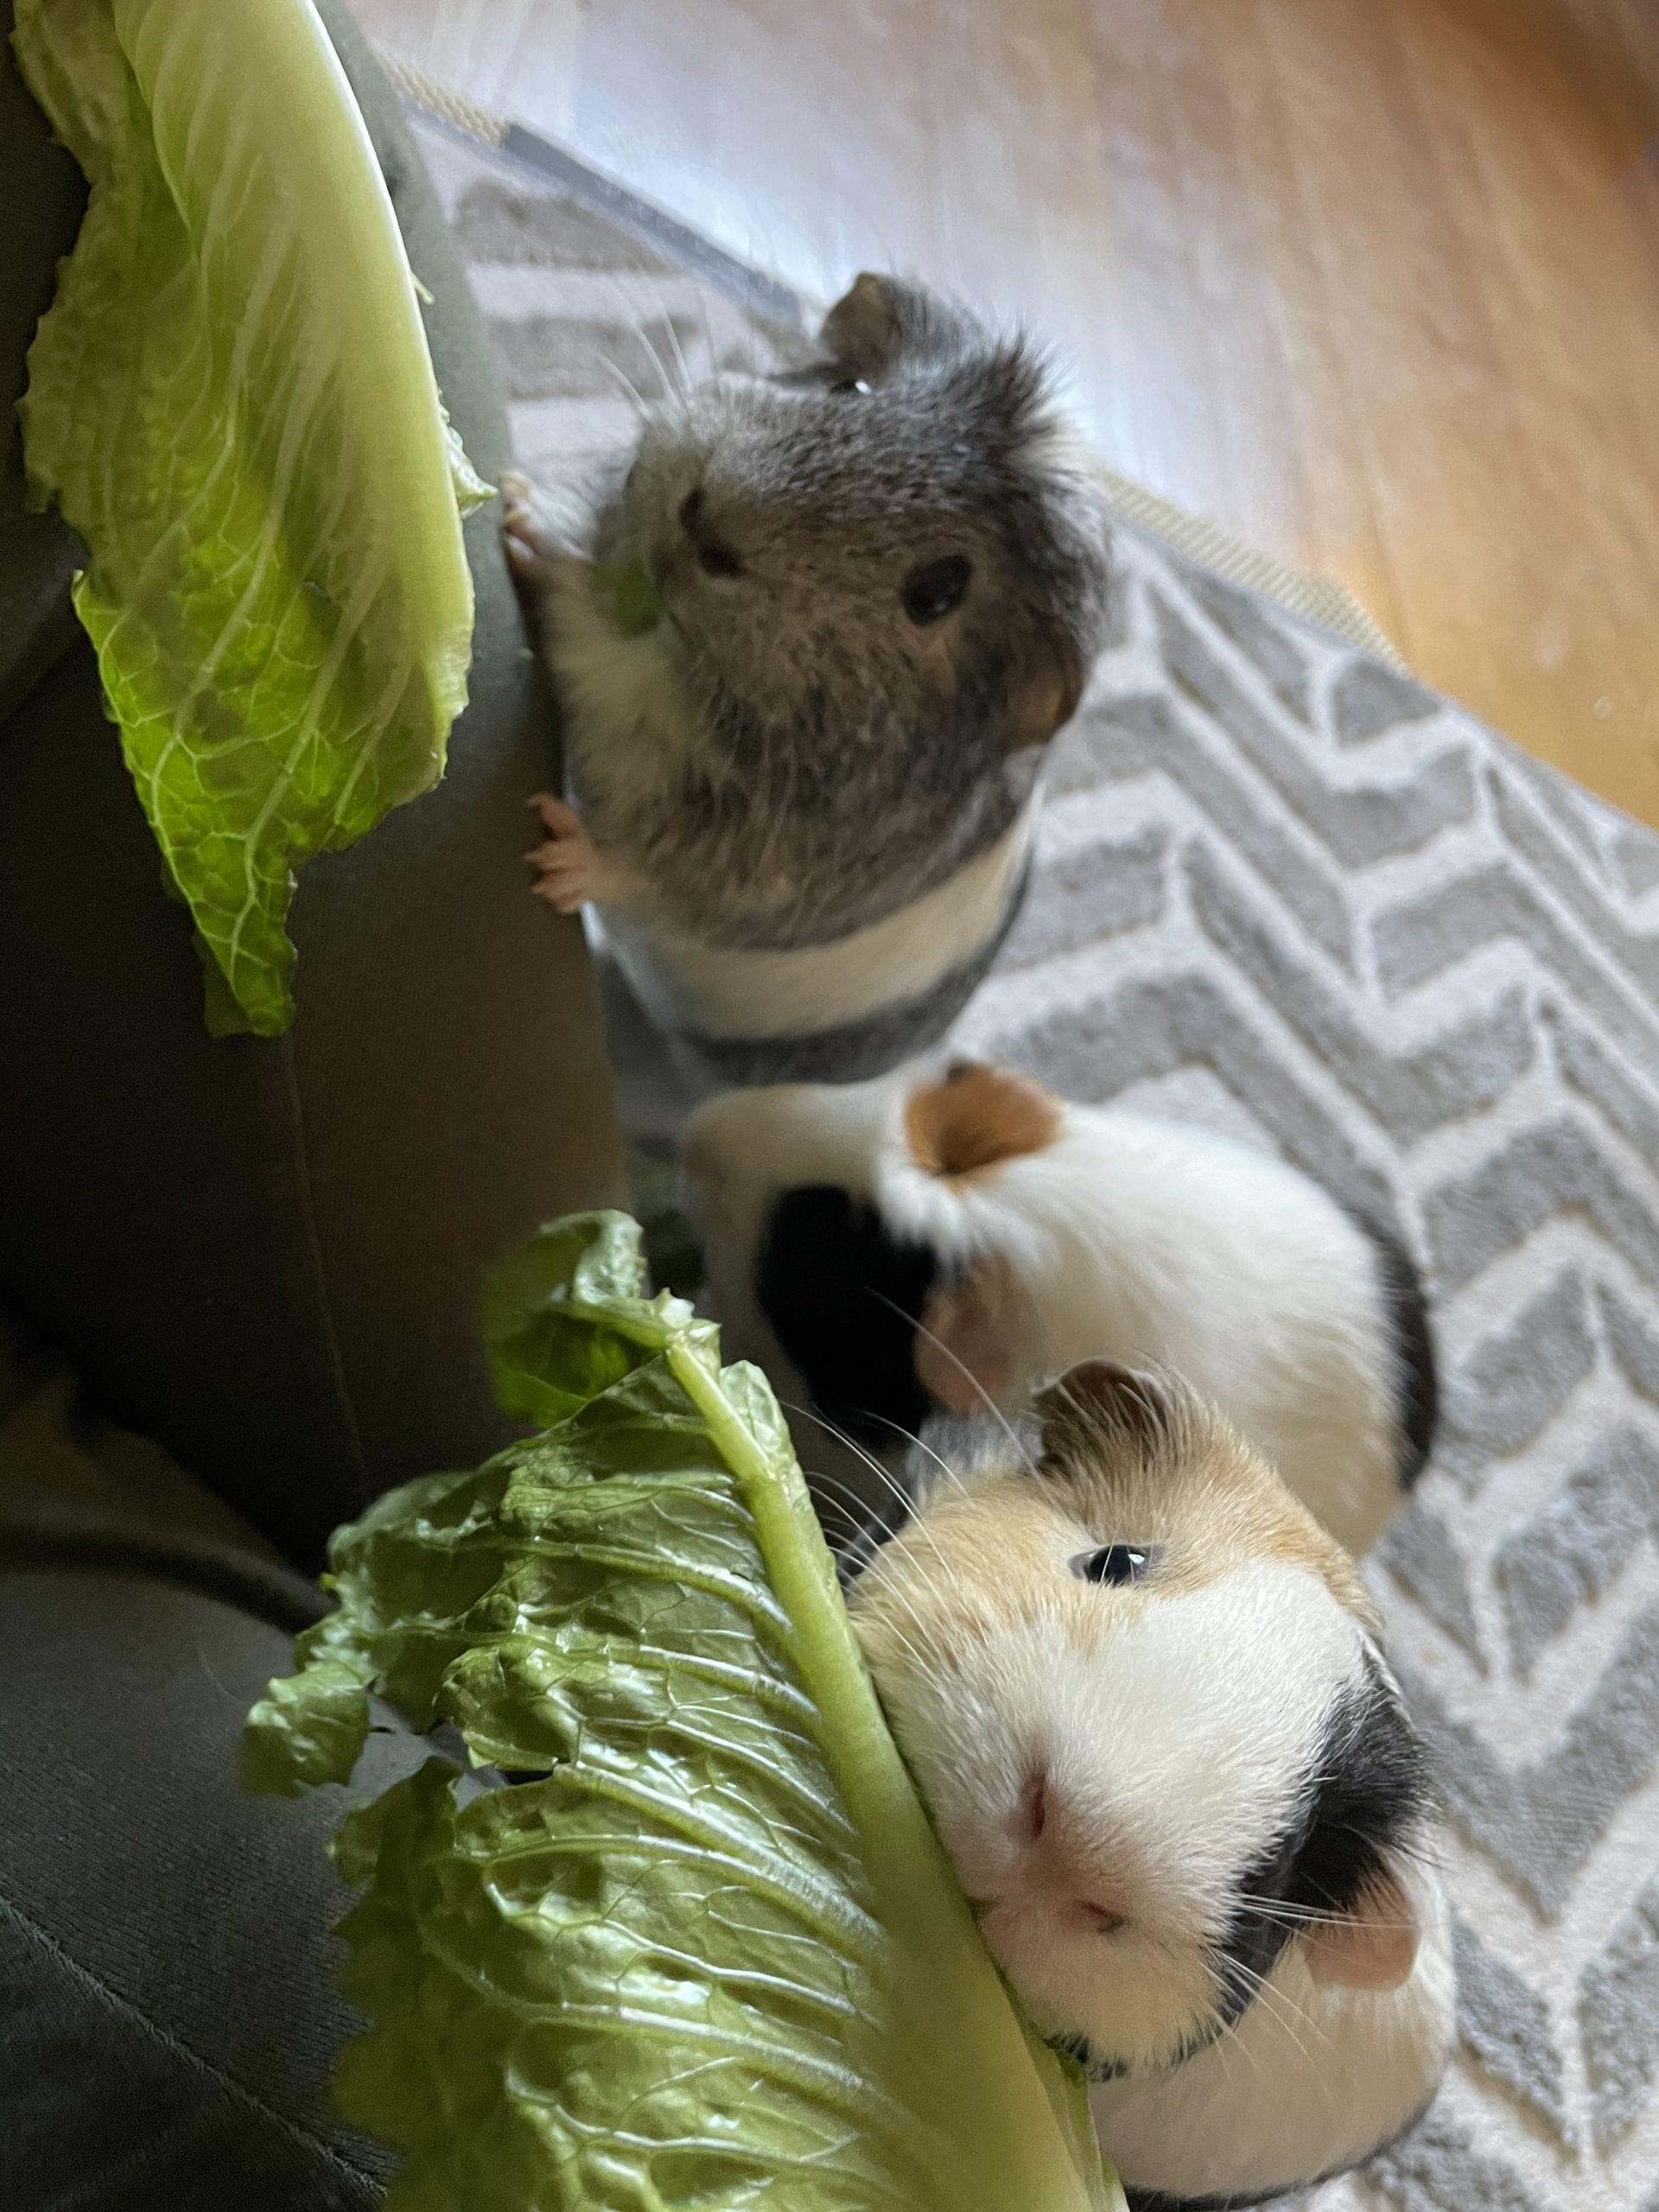 Image of 3 guinea pigs.